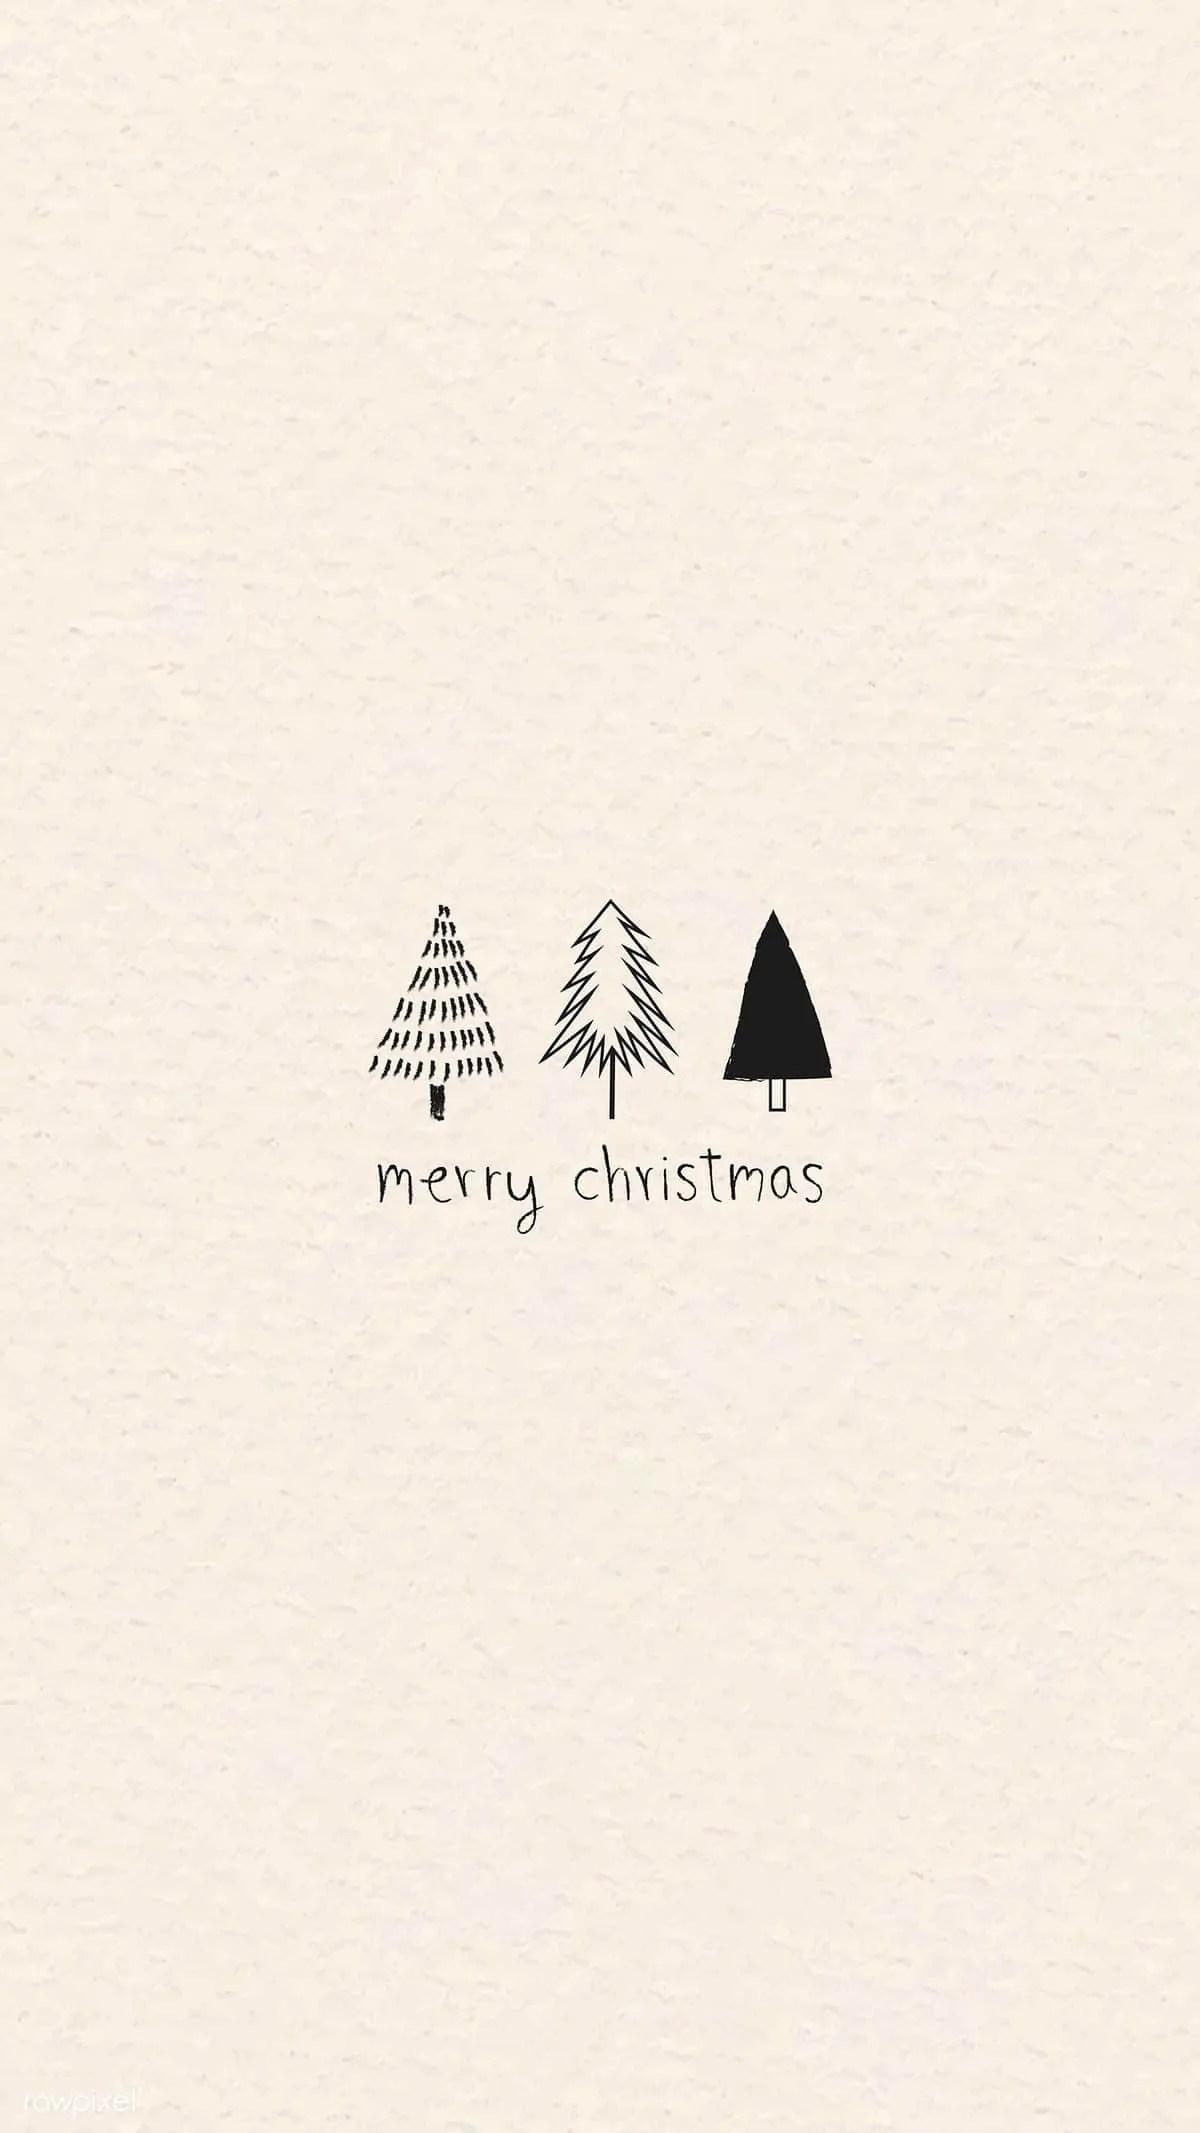 Download-premium-vector-of-Christmas-mobile-phone-wallpaper-vector-1228270 5